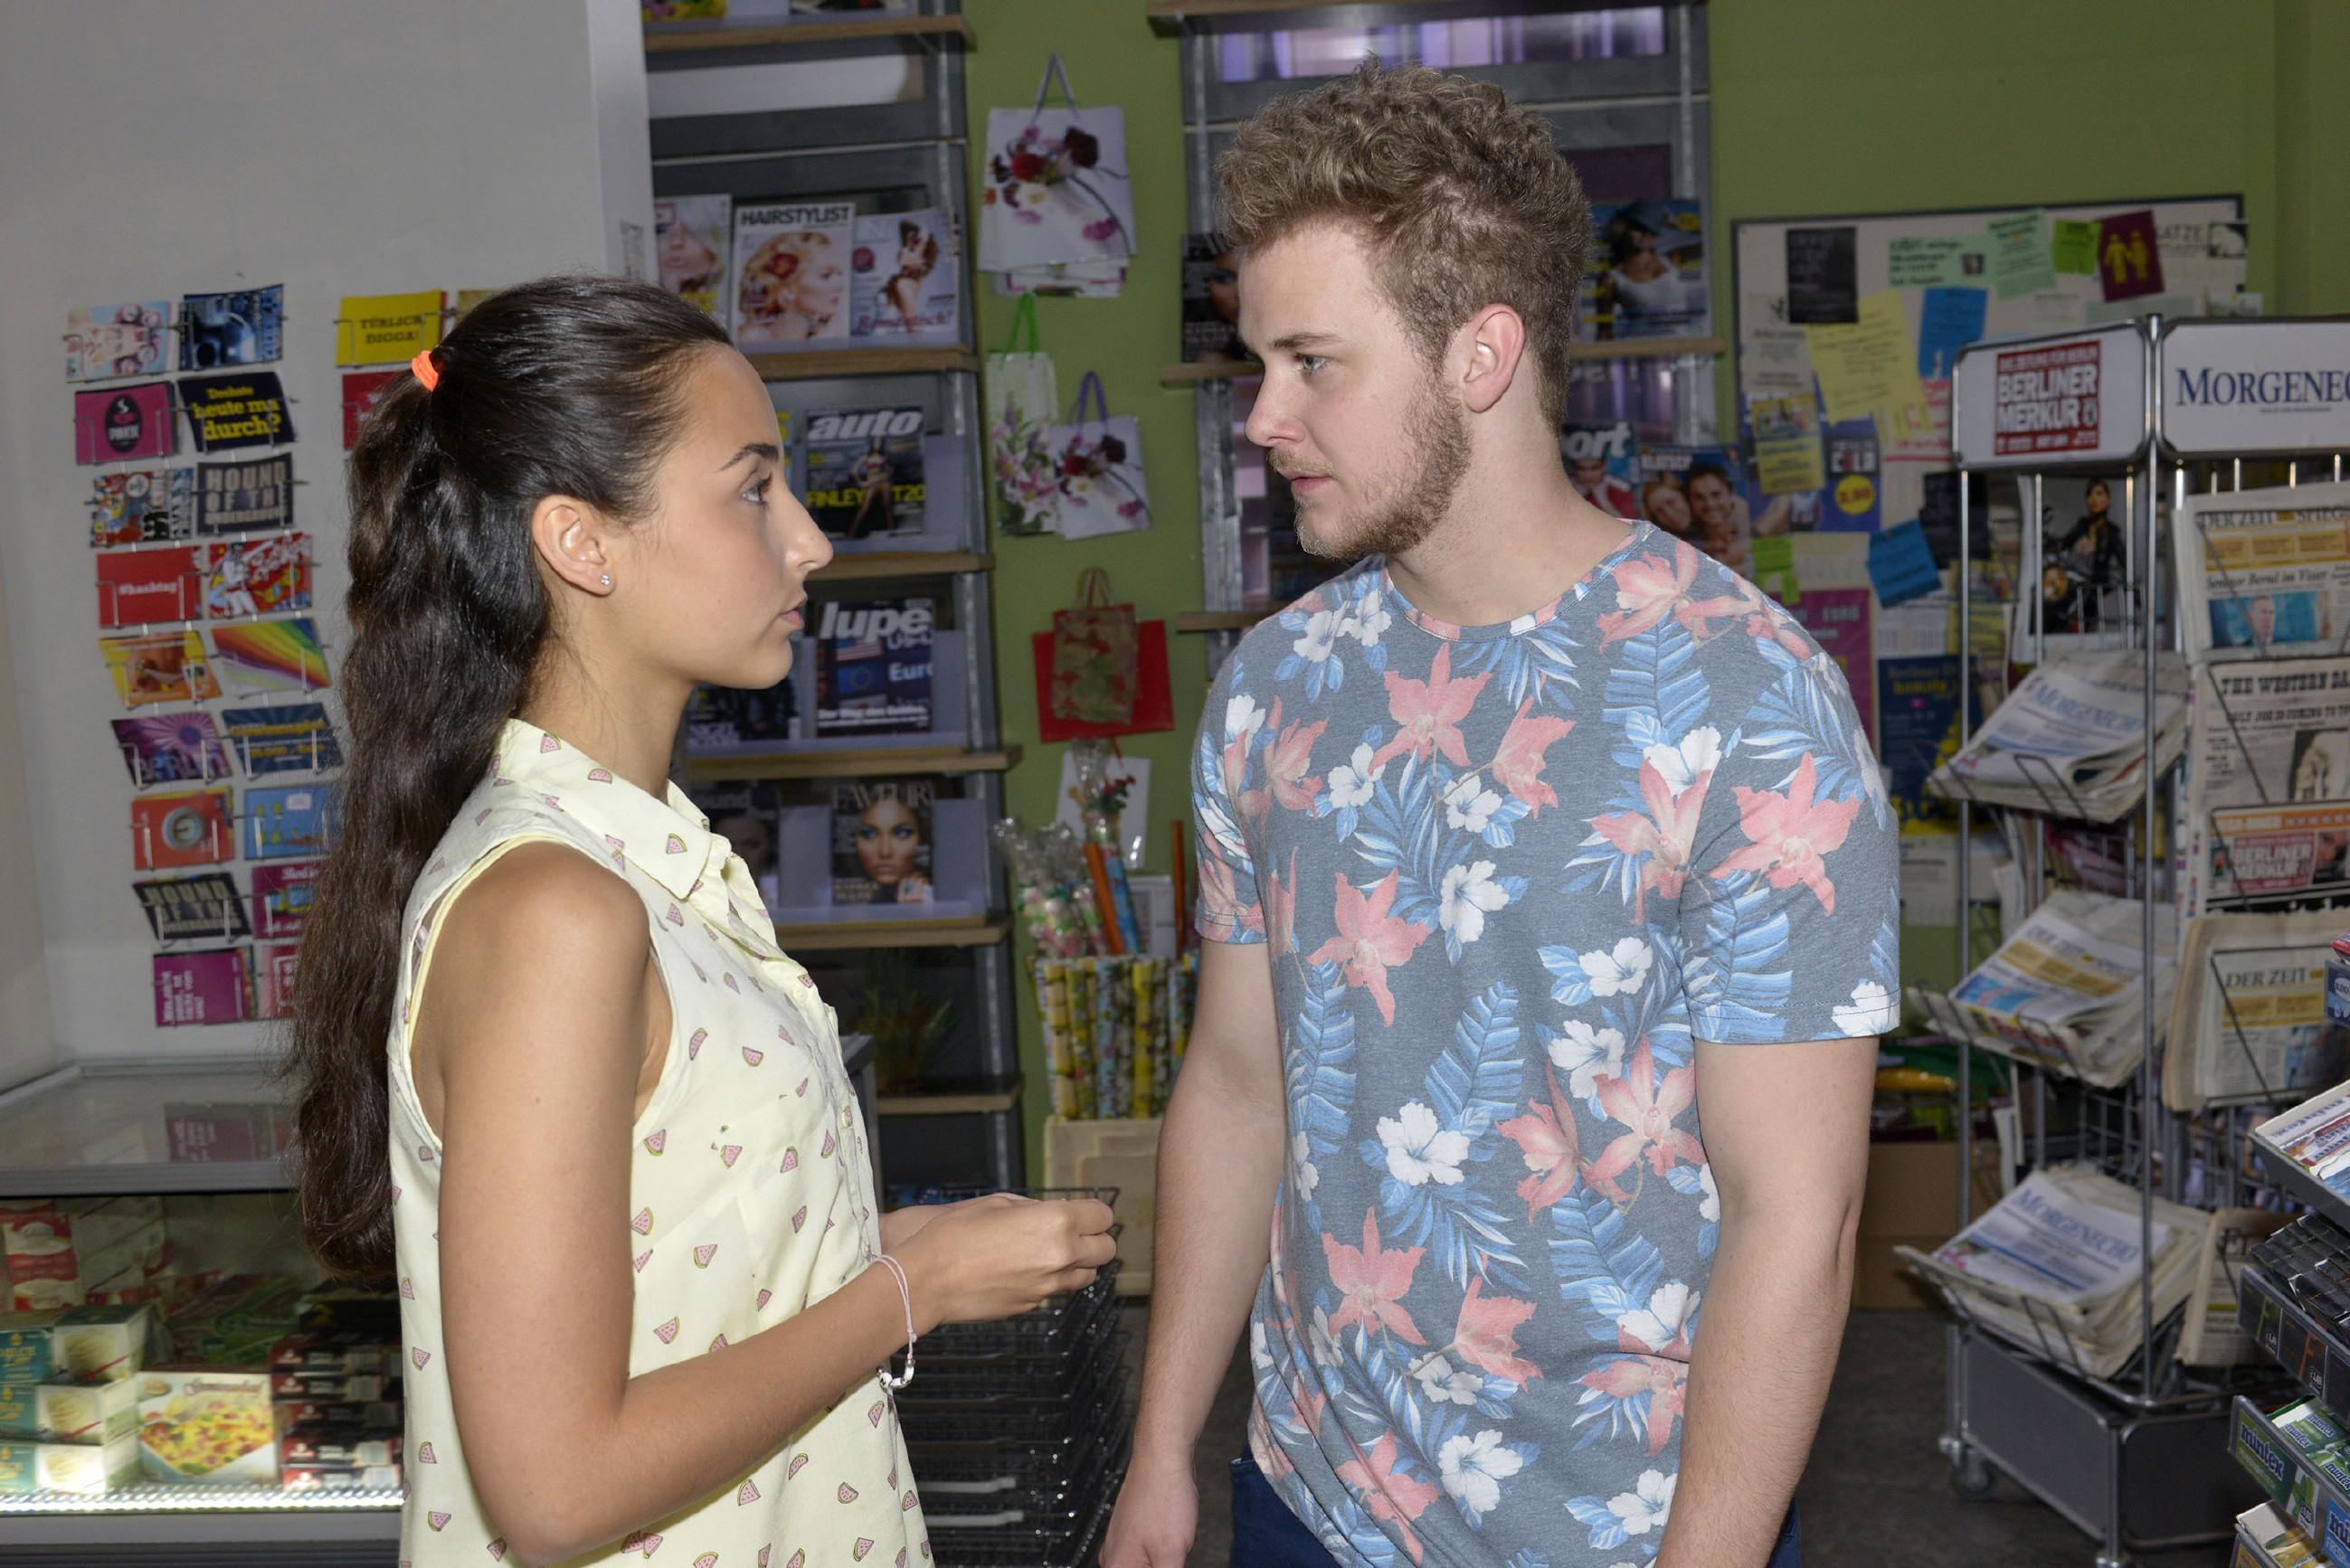 Jonas (Felix van Deventer) ist geschockt, als Selma (Rona Özkan) ihn mit ihrer Entscheidung konfrontiert... (RTL / Rolf Baumgartner)